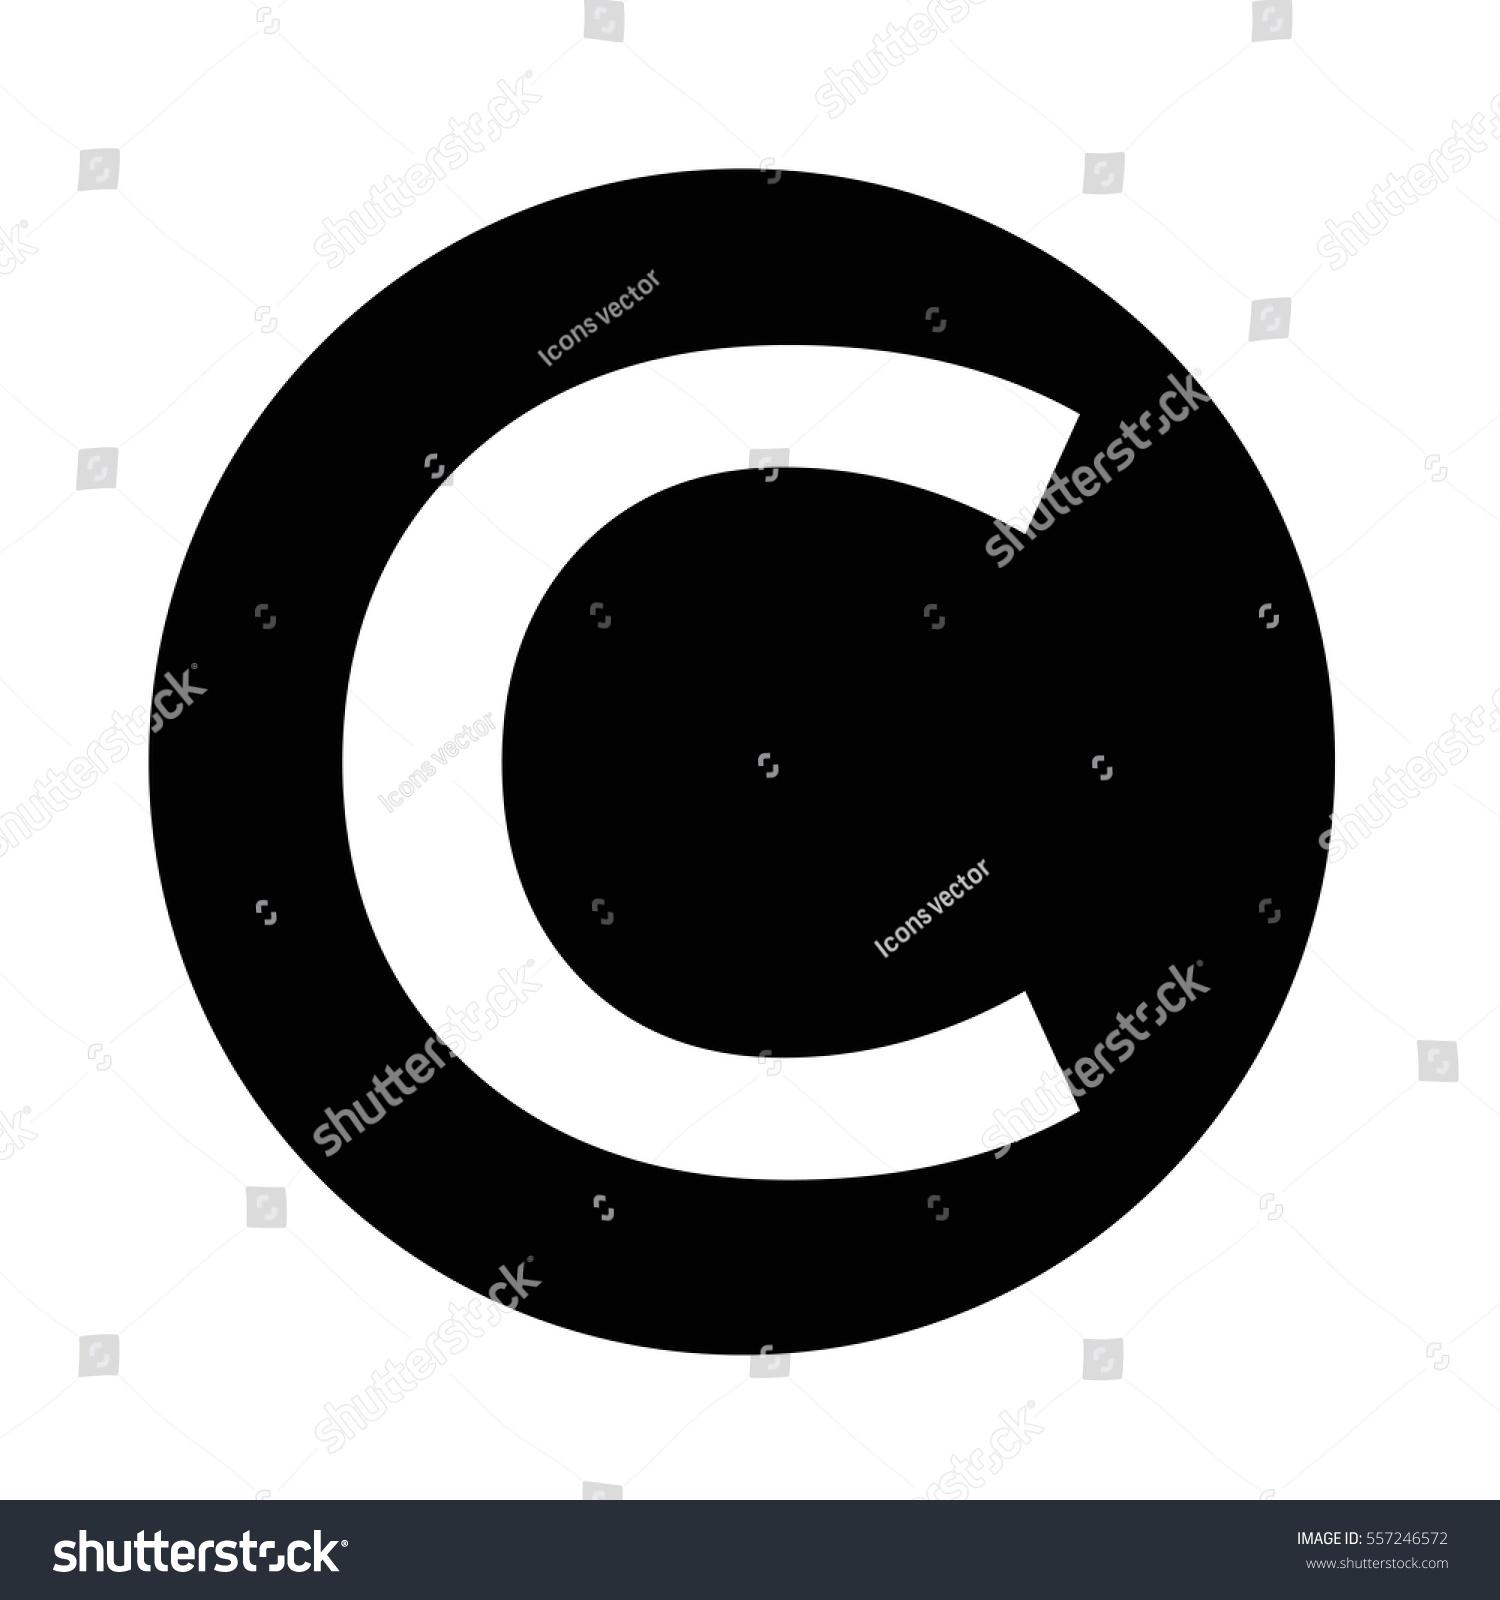 Copyright symbol icon stock vector 557246572 shutterstock copyright symbol icon biocorpaavc